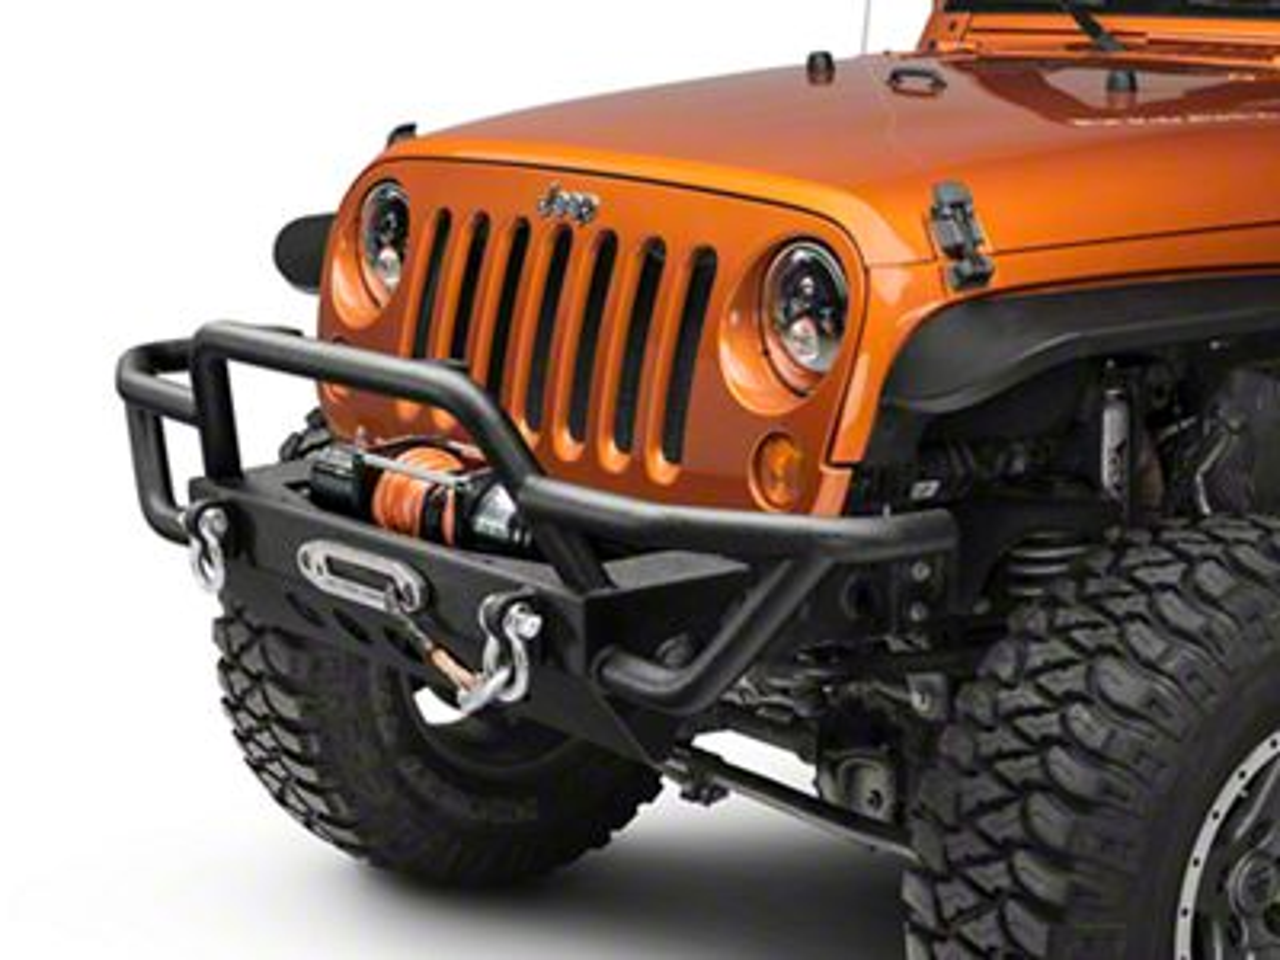 Add RedRock 4x4 Rock Crawler Front Bumper (07-17 Wrangler JK)